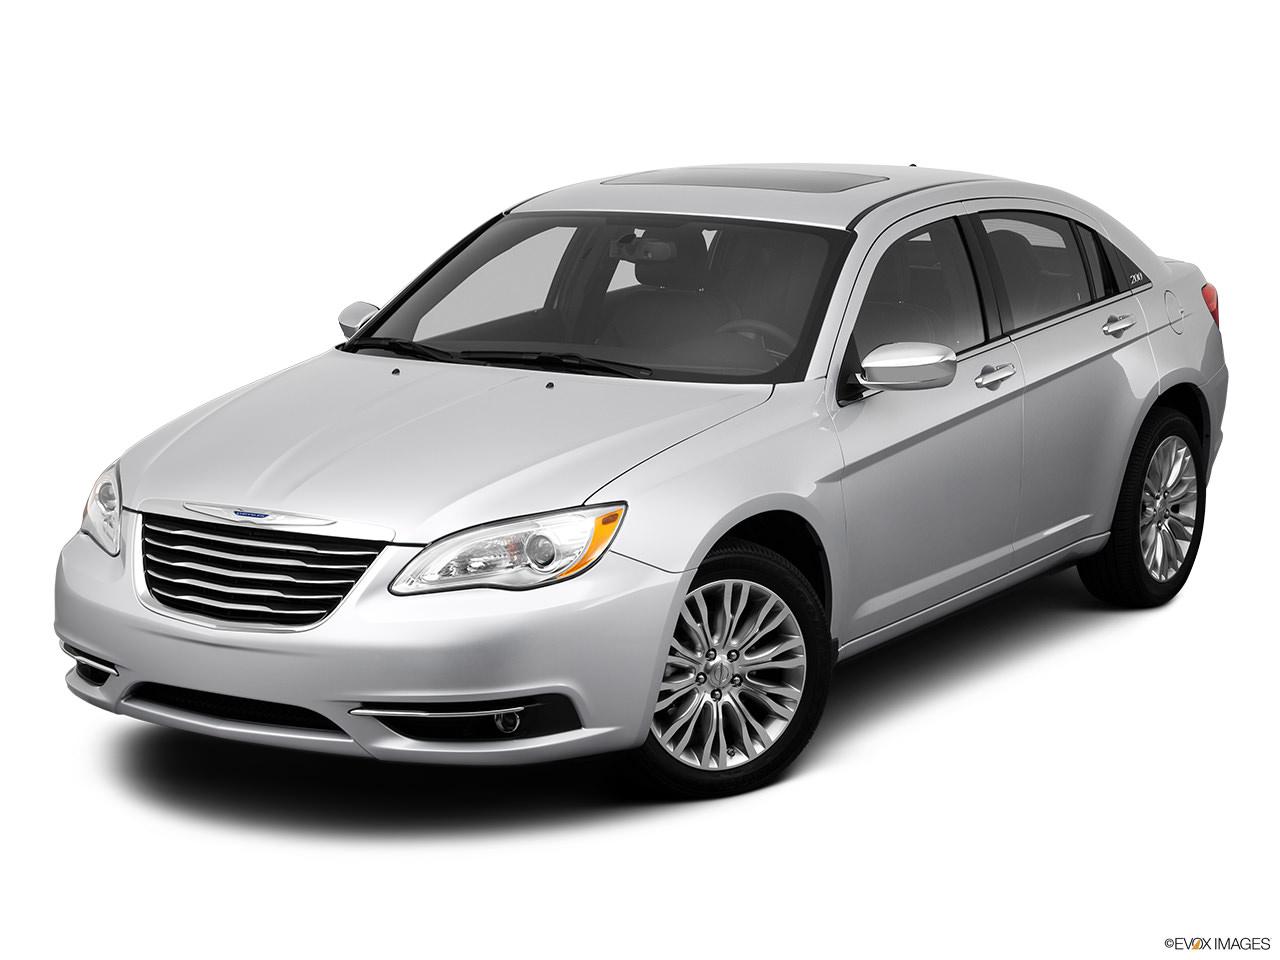 Chrysler 200: How The Active Head Restraints (AHR) Work